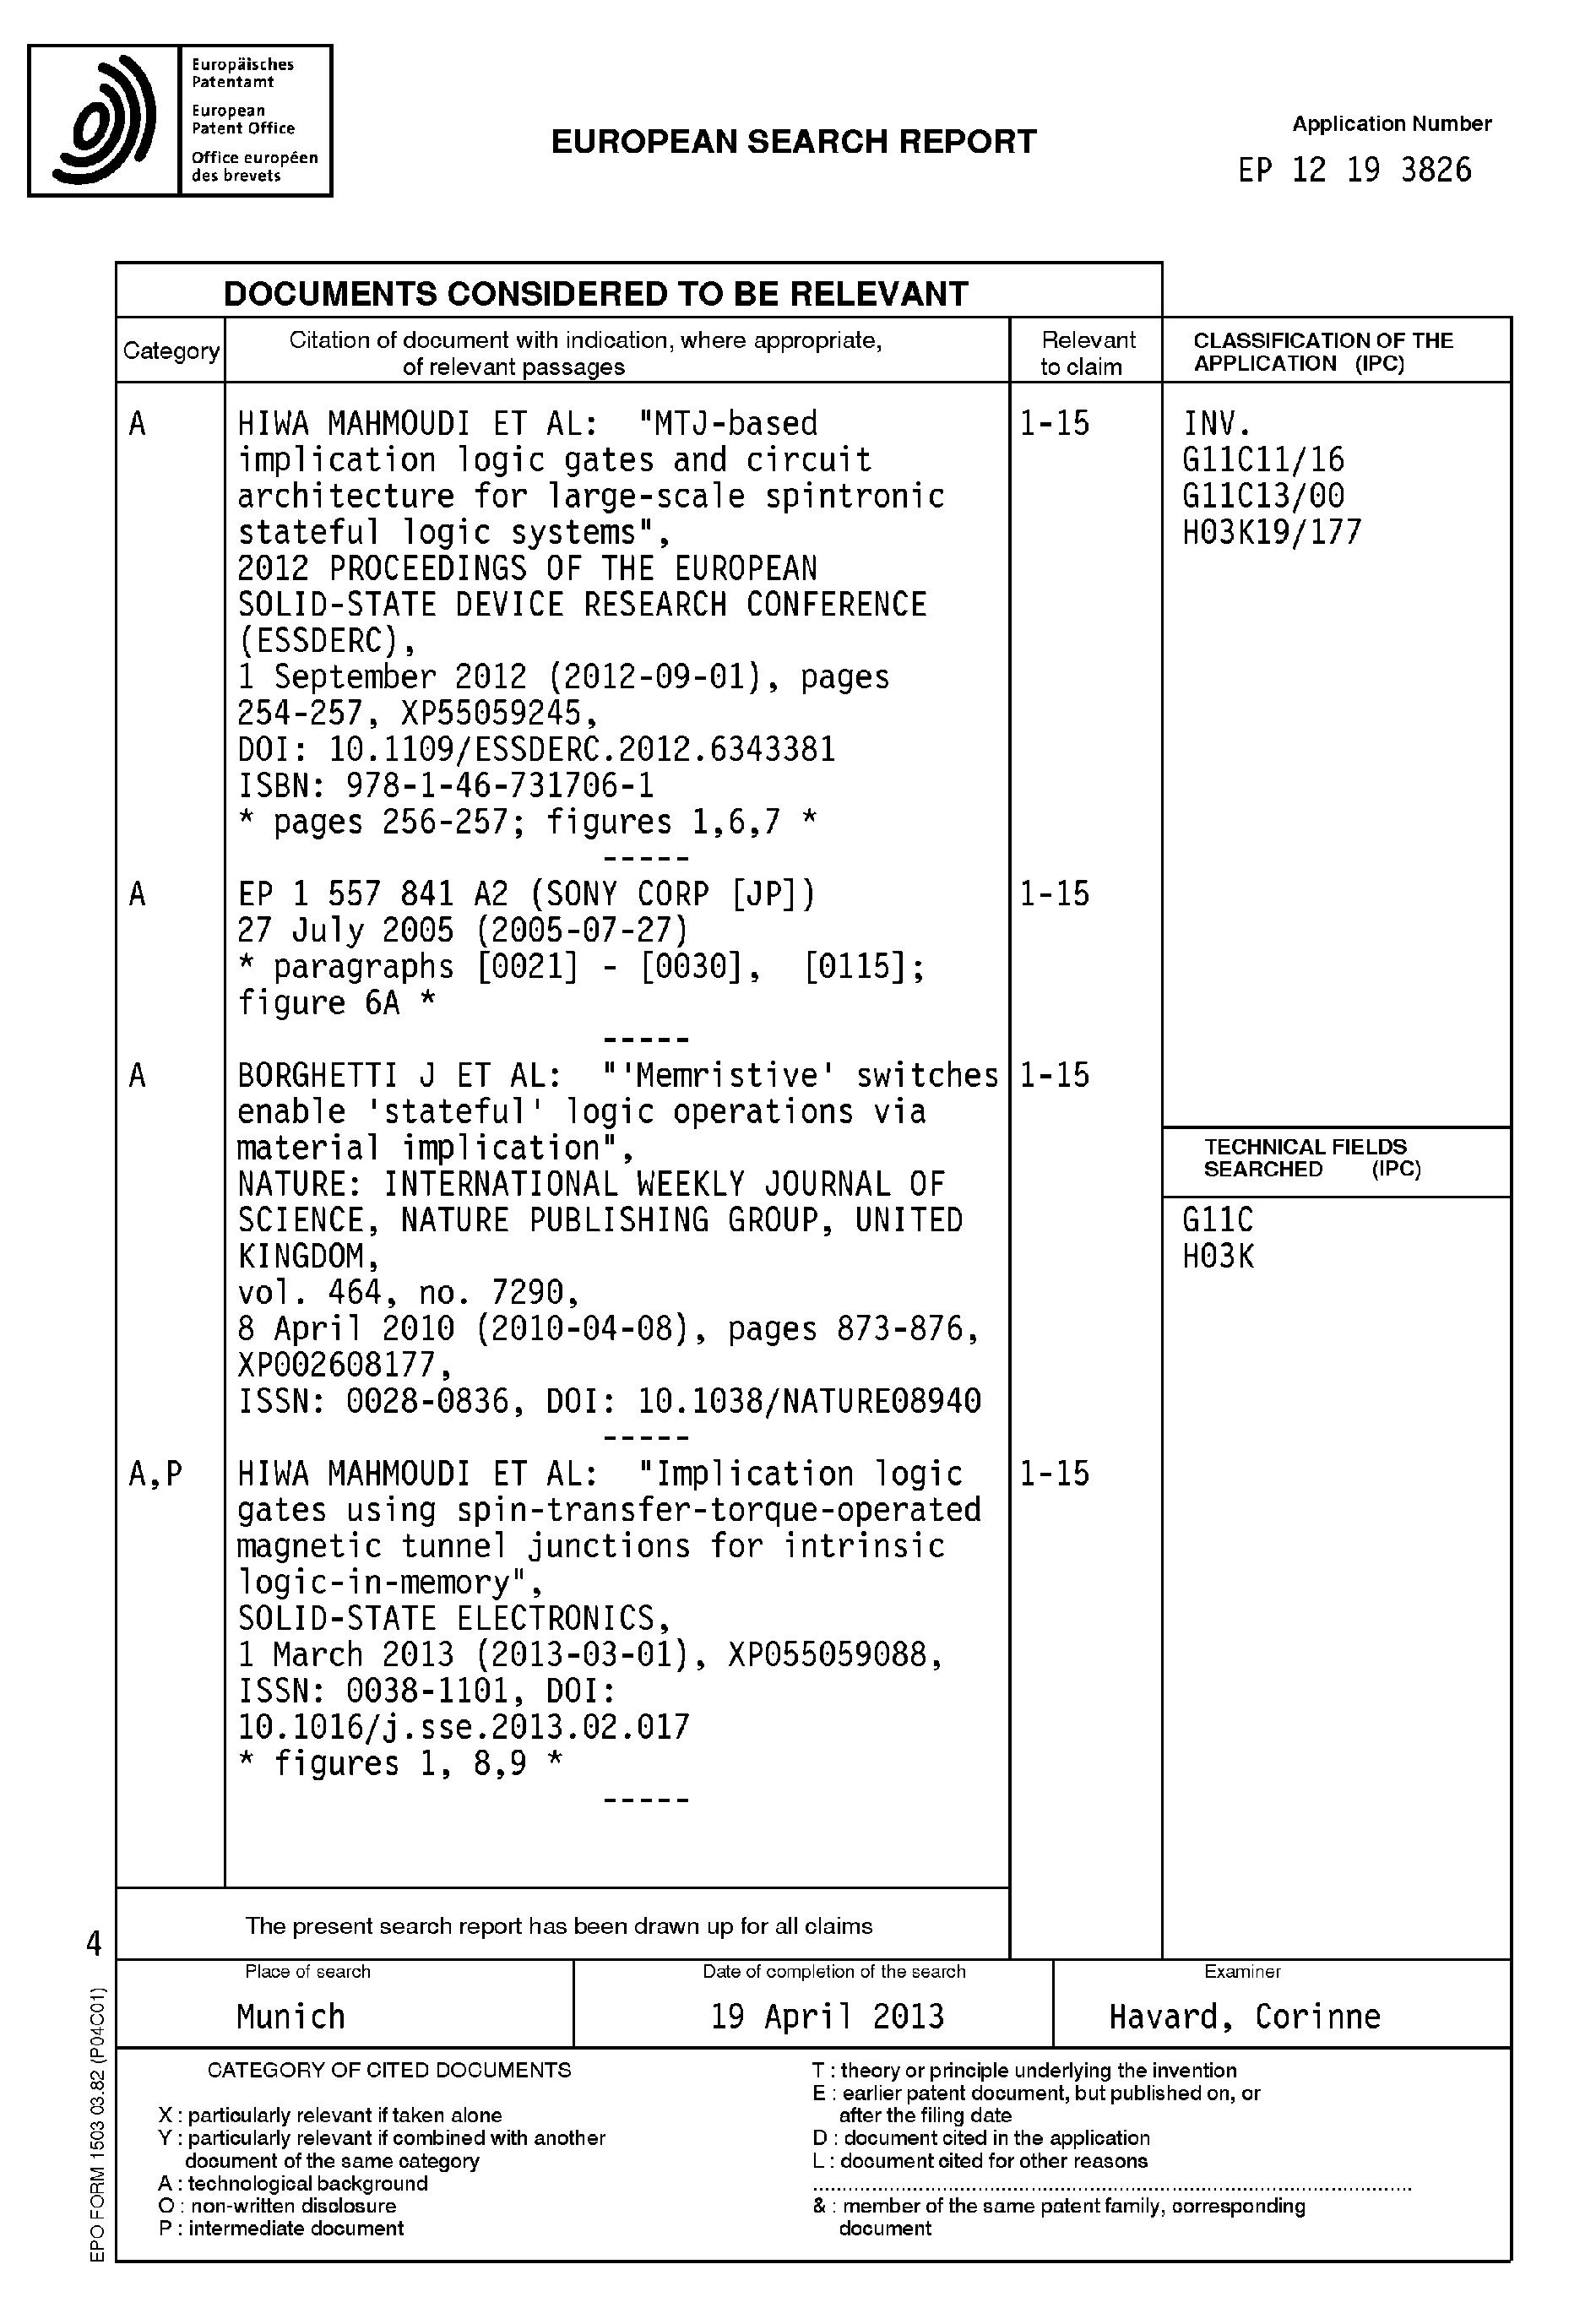 Mtj Implications Logic Gate Diagram Wiring Diagrams Ladder Symbols Patent Ep2736044a1 Rram Implication Gates Google Patents